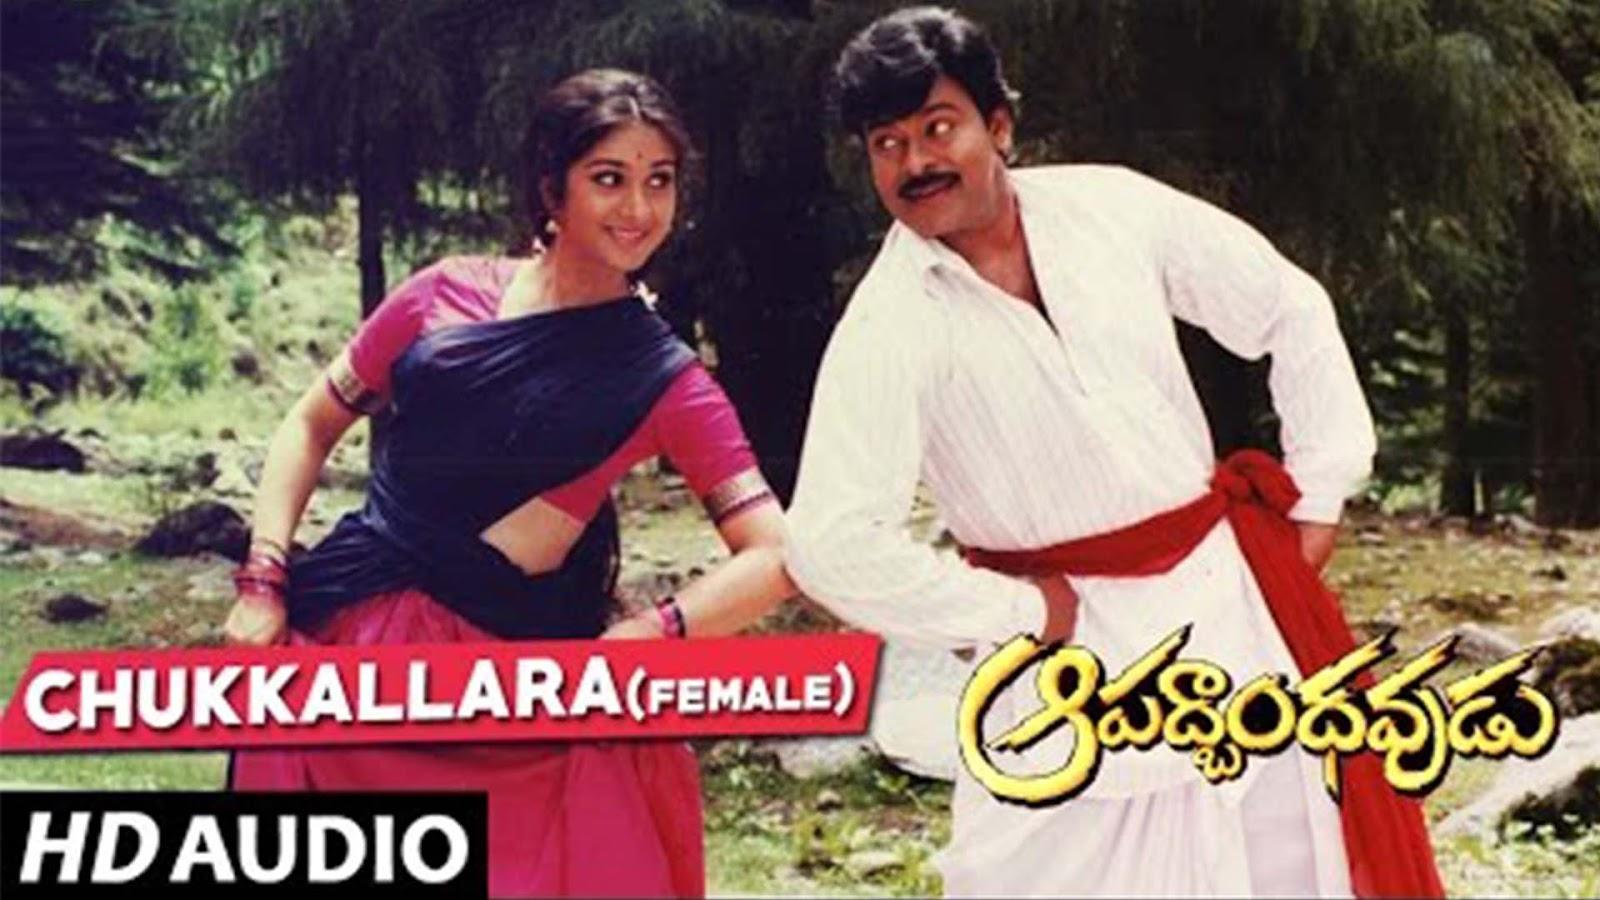 Chukkallara Choopullara Female Telugu Song Lyrics -9712